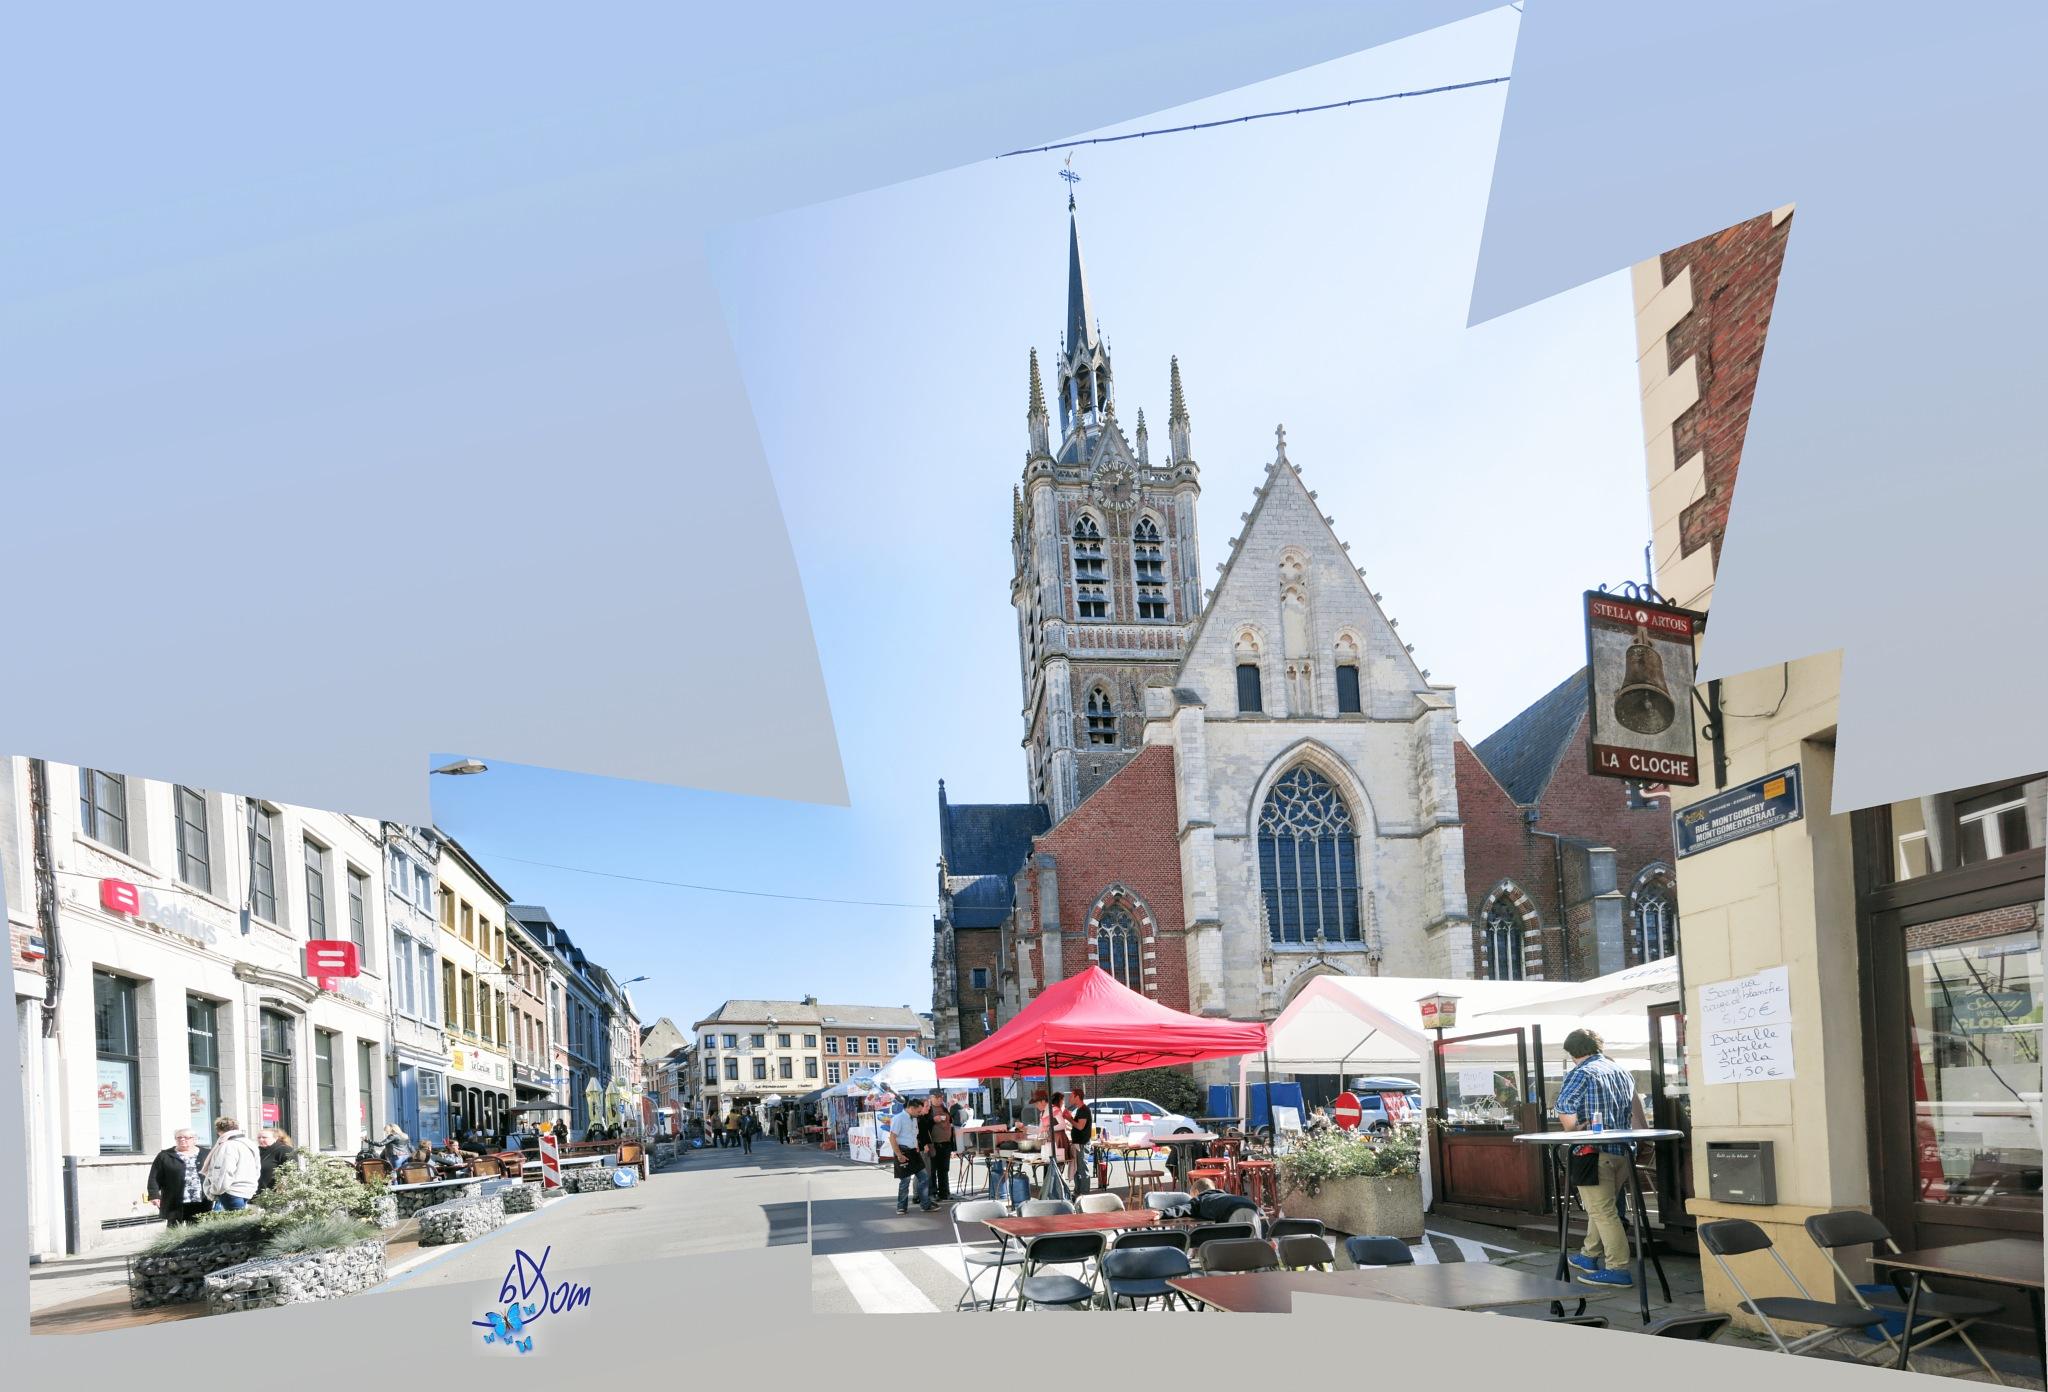 Place d'Enghien by dominiquebruyneel